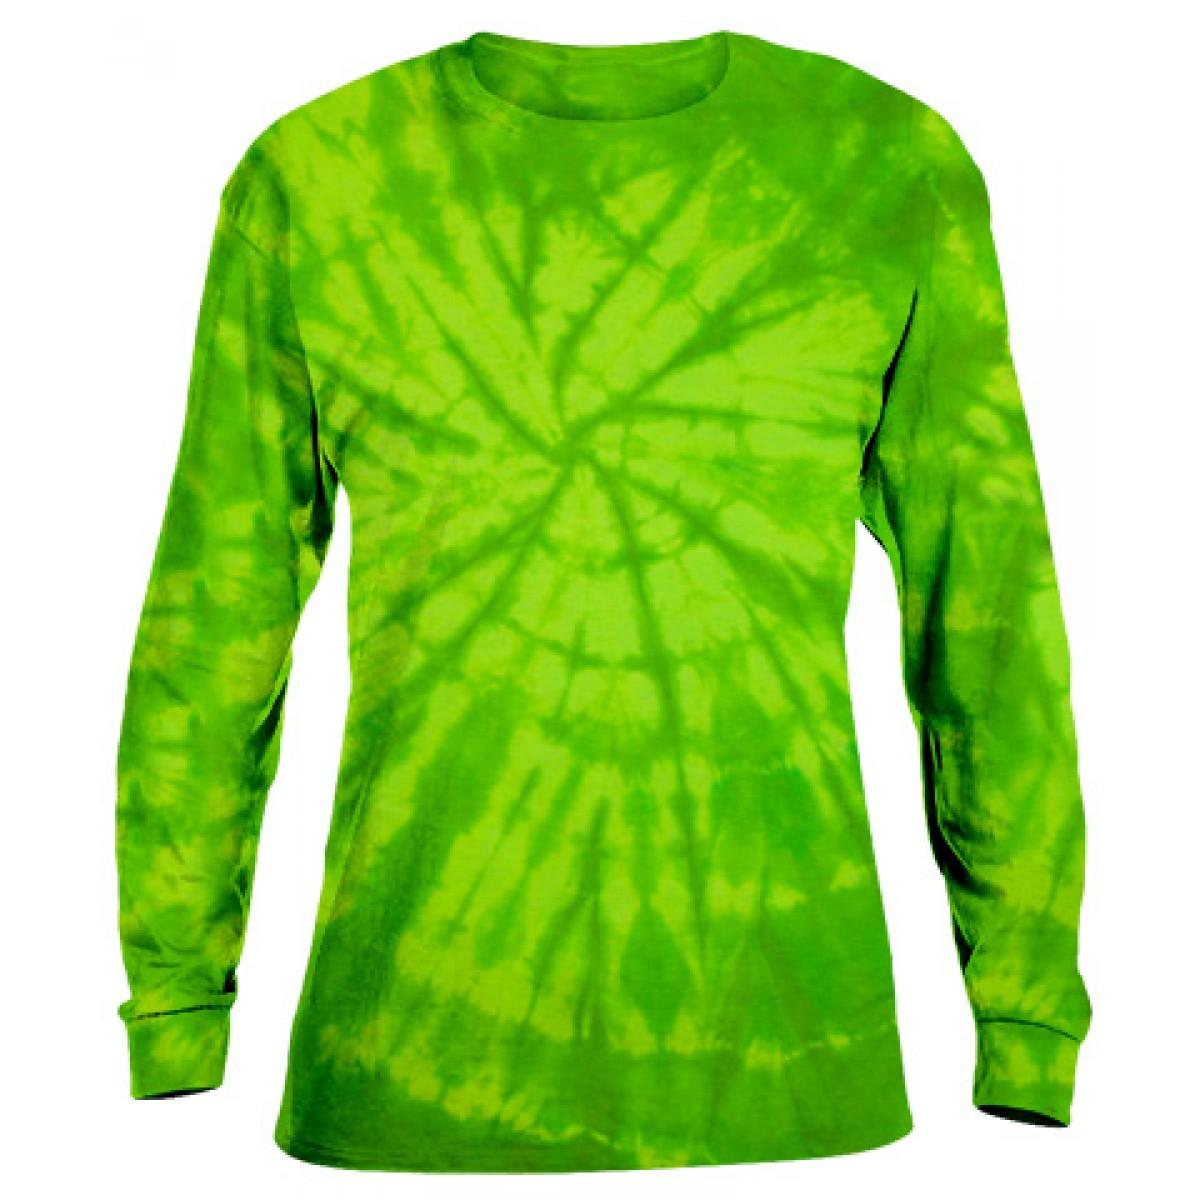 Tie-Dye Long Sleeve Shirt -Lime Green-YL